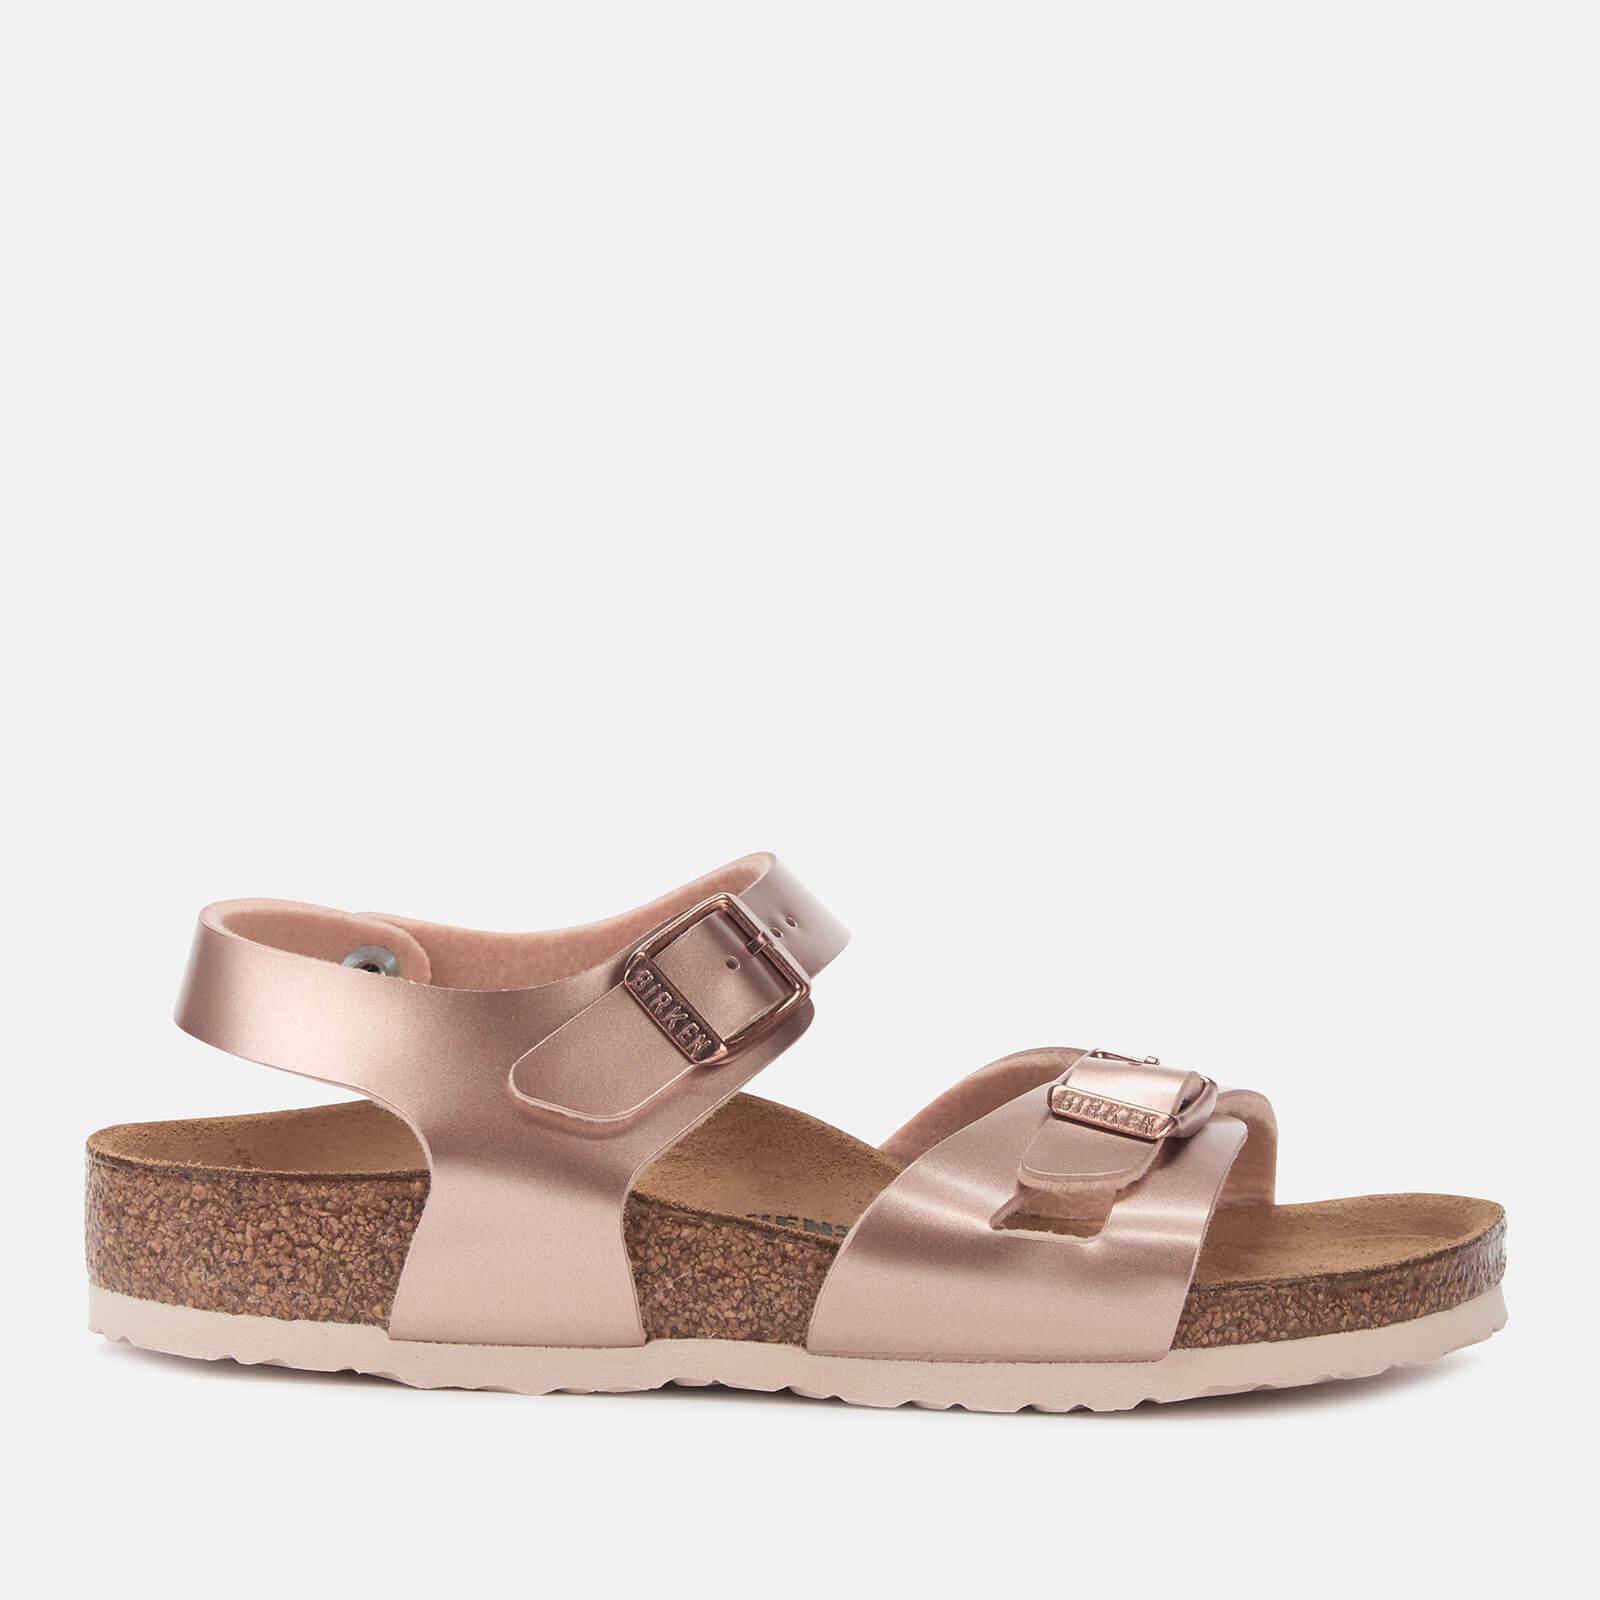 Birkenstock Kids' Rio Slim Fit Double Strap Sandals - Electric Metallic Copper - EU 29/UK 11